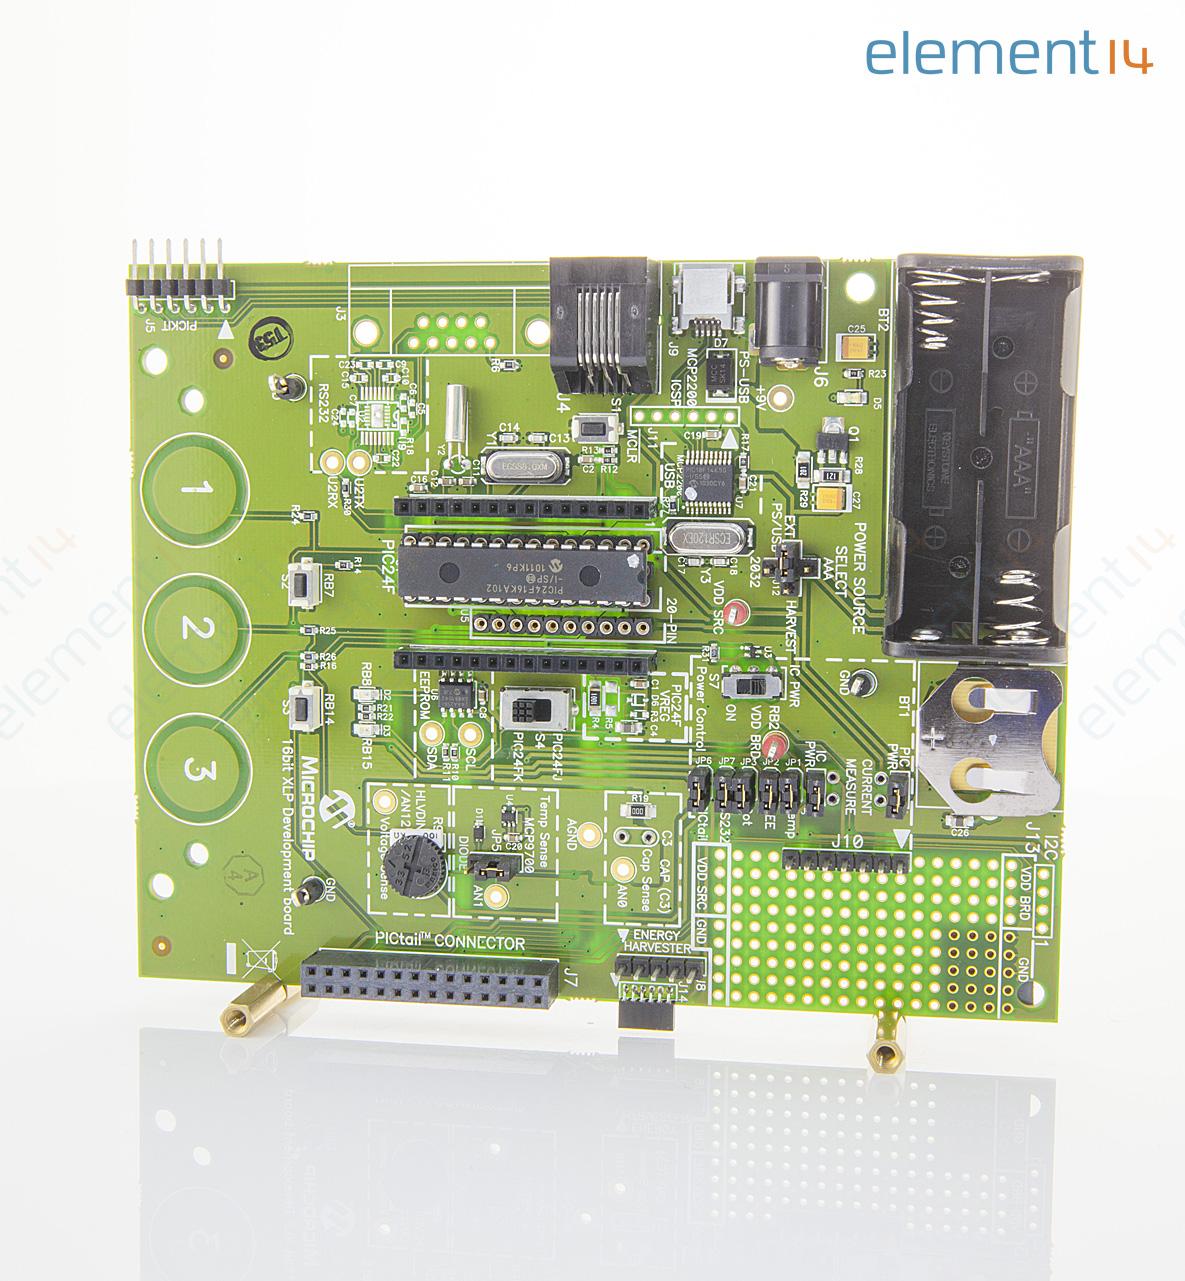 Dm240311 Microchip Development Board Pic24f16ka102 Xlp Realtime Clock Calendar Ic Electronics And Electrical Engineering Richmedia 351kb En